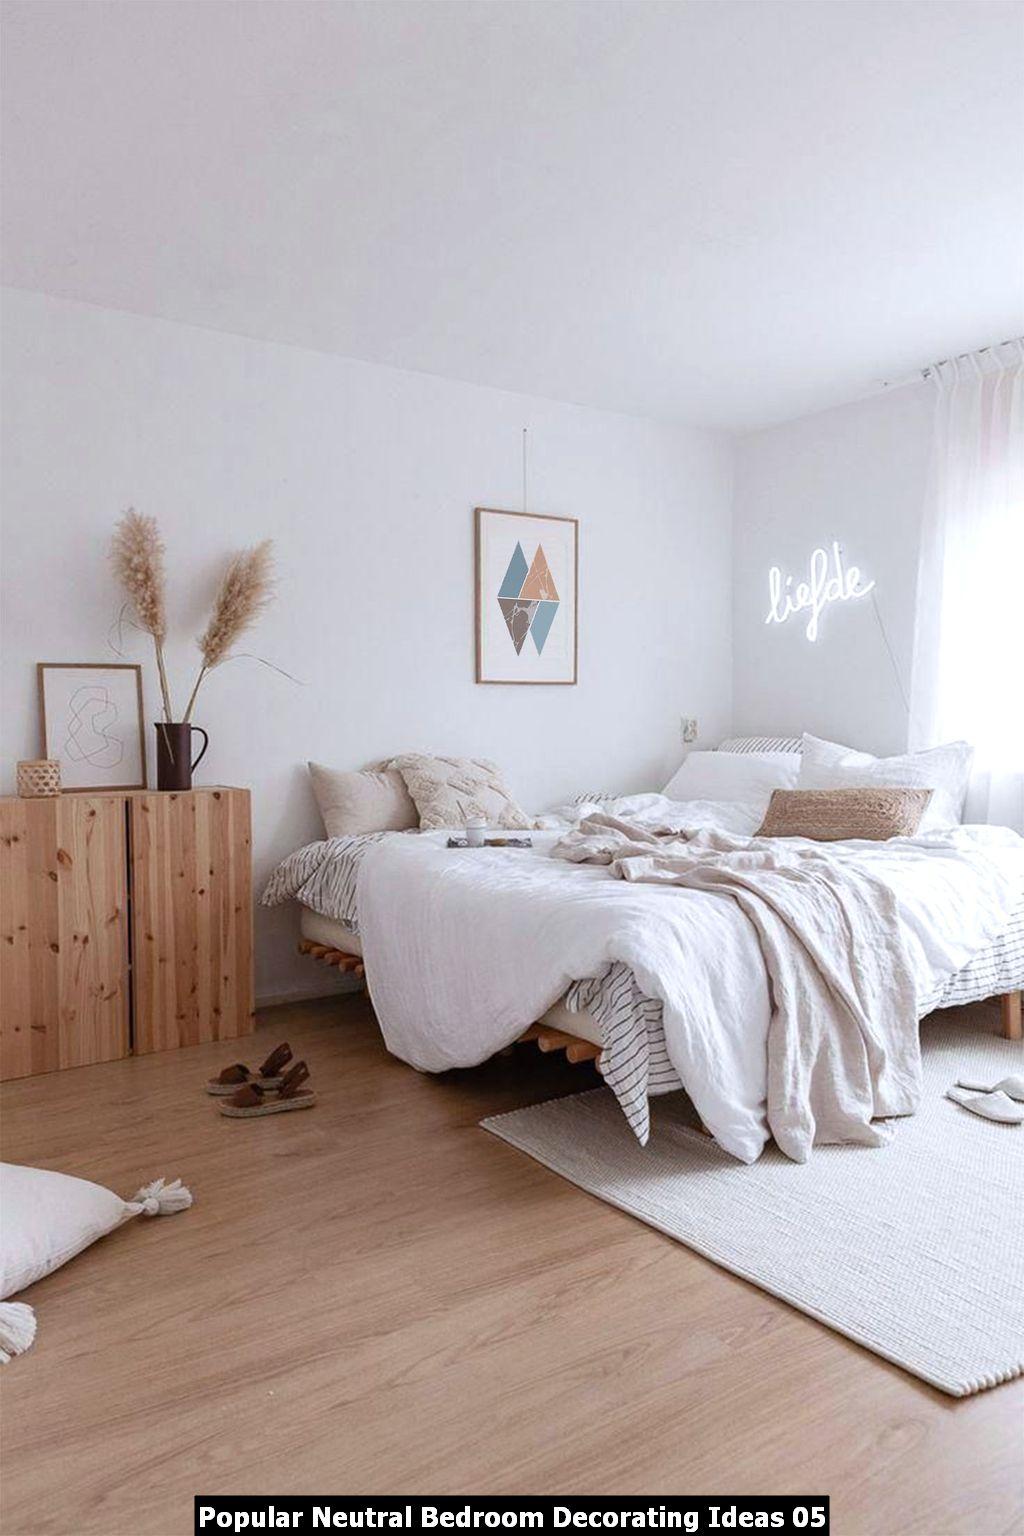 Popular Neutral Bedroom Decorating Ideas 05